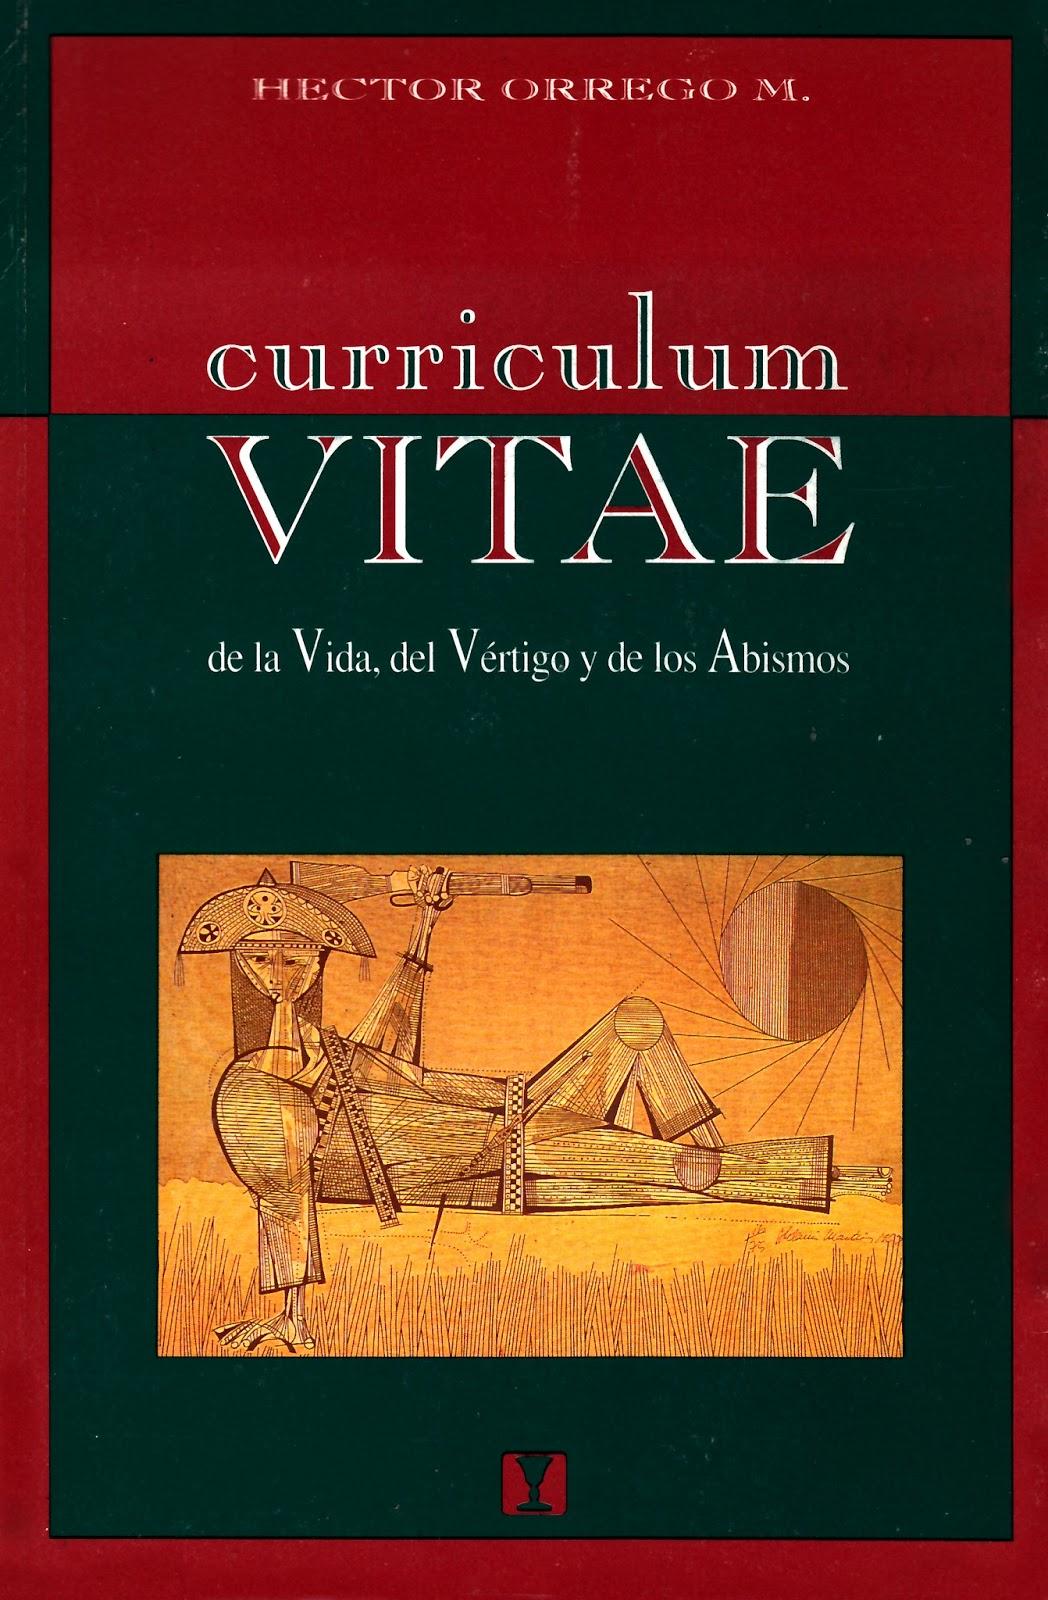 Curriculum Vitae - Héctor Orrego | LECTURA y CULTURA SIN EGOÍSMO